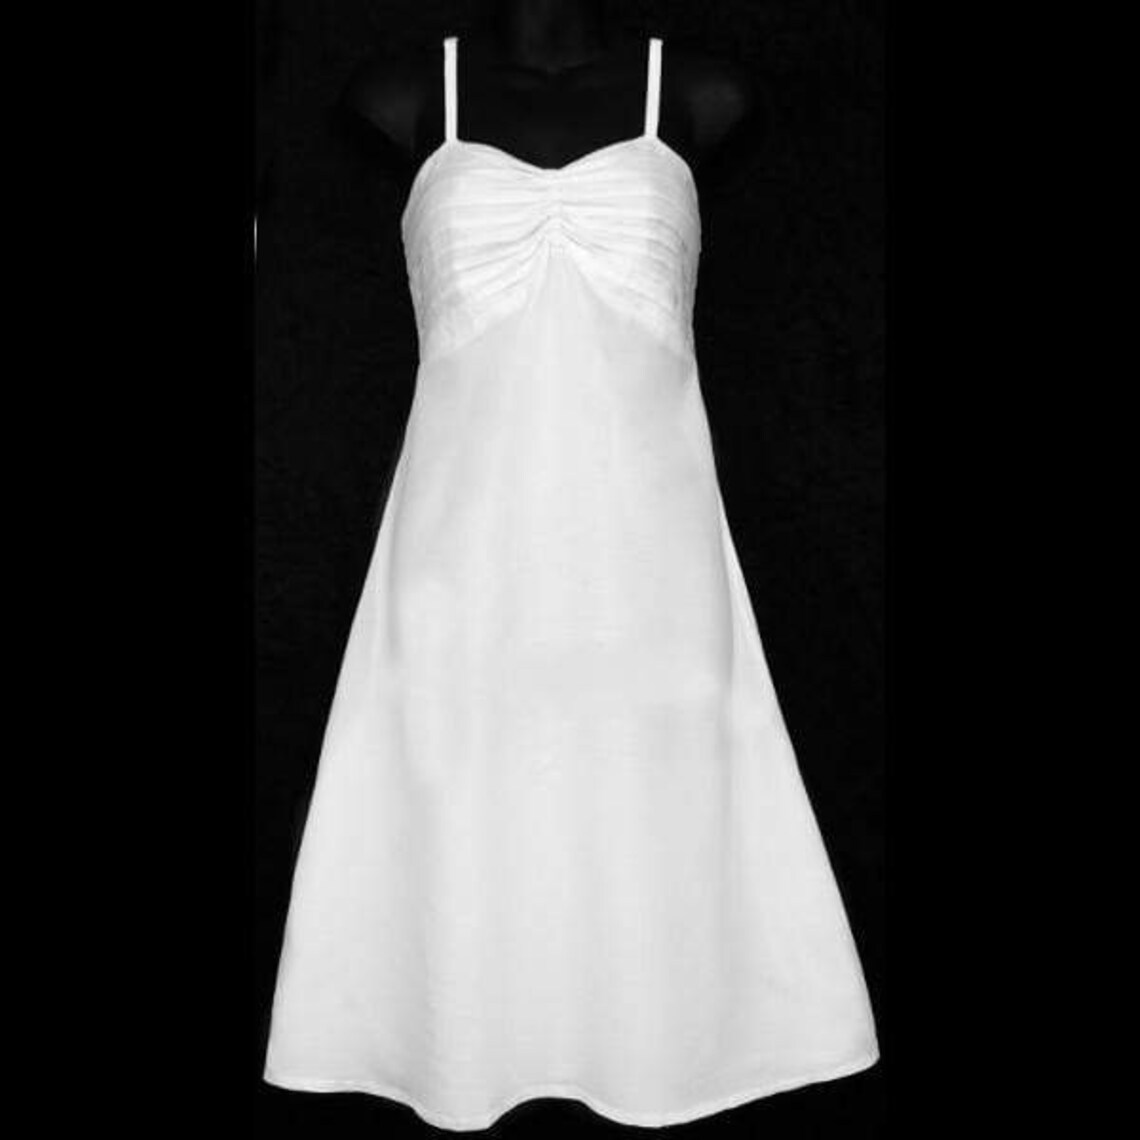 Tie-Dyed Geode design Sun Dress